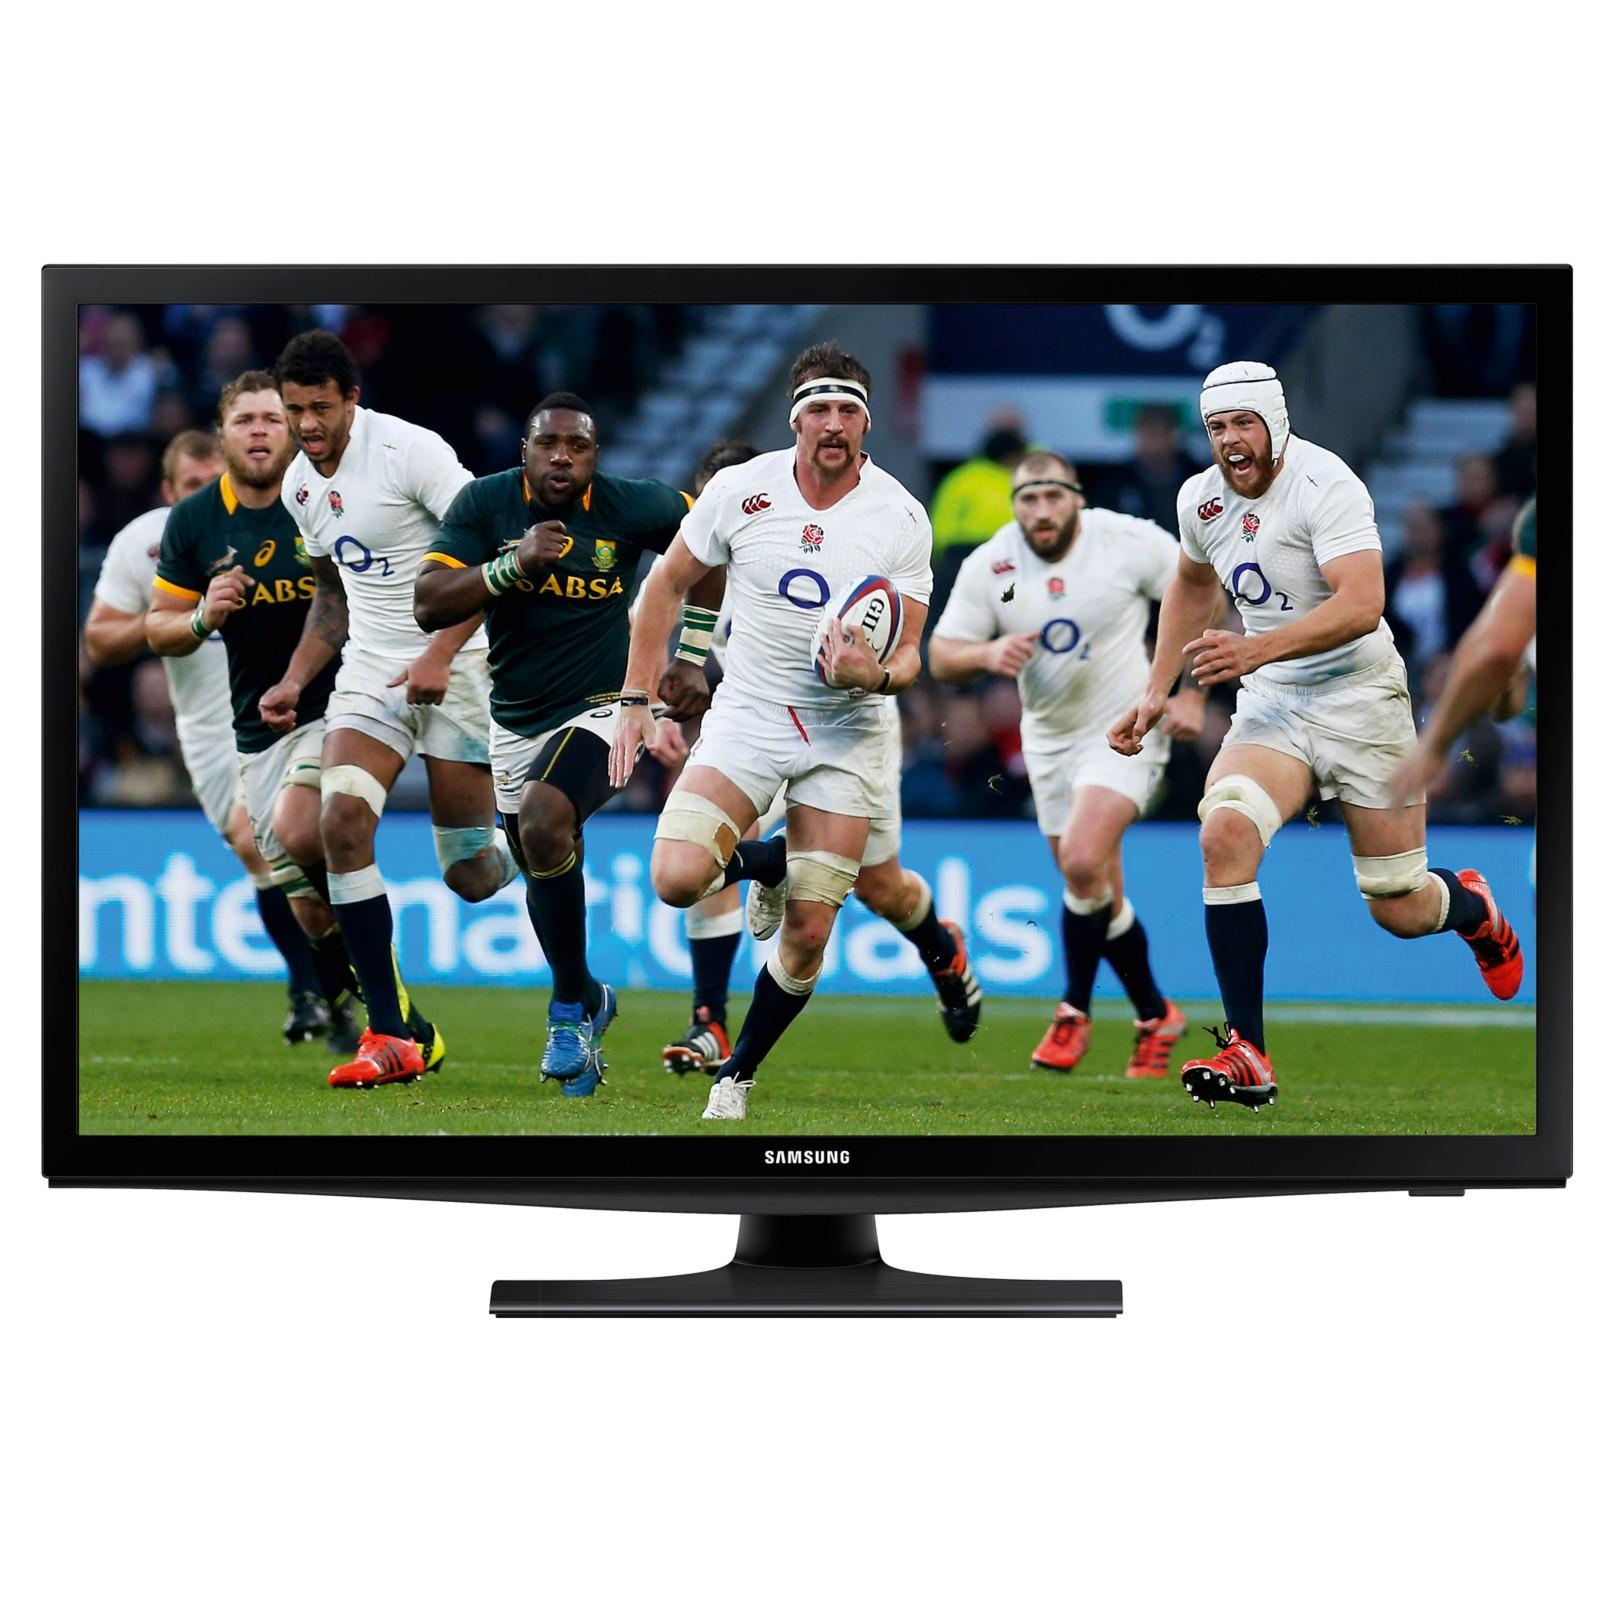 Samsung UE28J4100 LED HD Ready TV